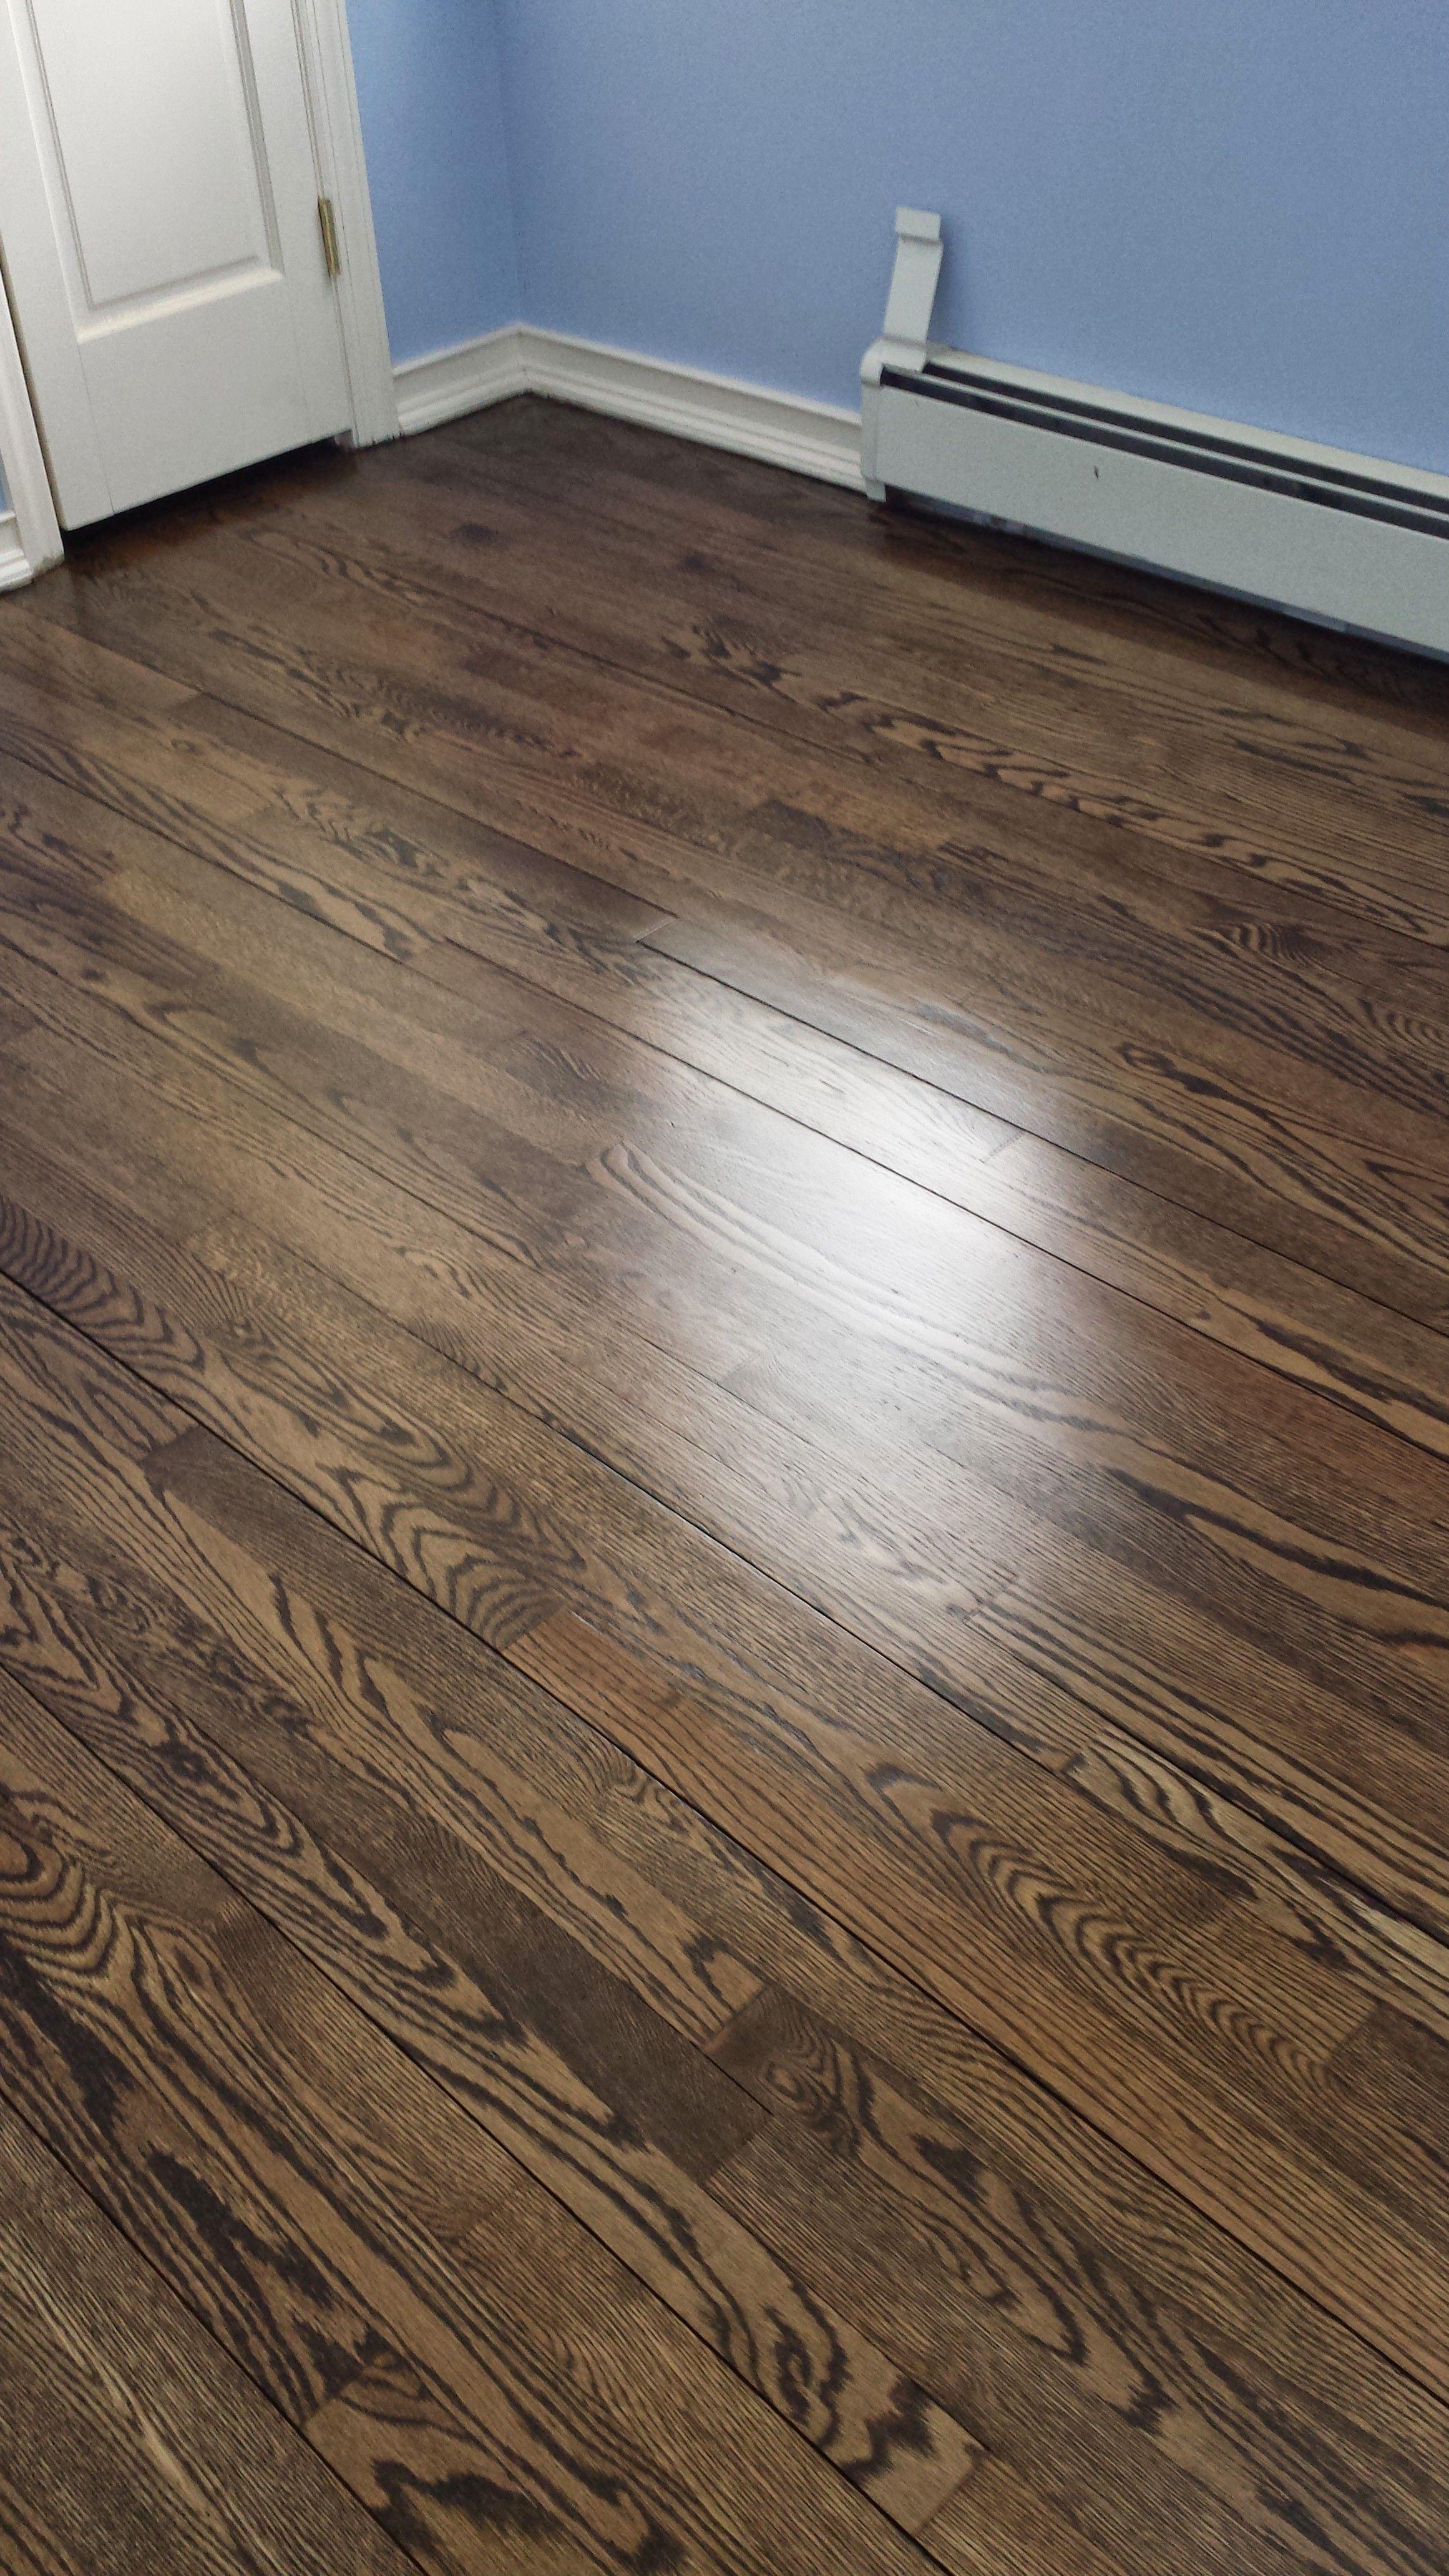 diy sand and stain hardwood floors of sanding hardwood floors diy floor within sanding hardwood floors diy great methods to use for refinishing hardwood floors